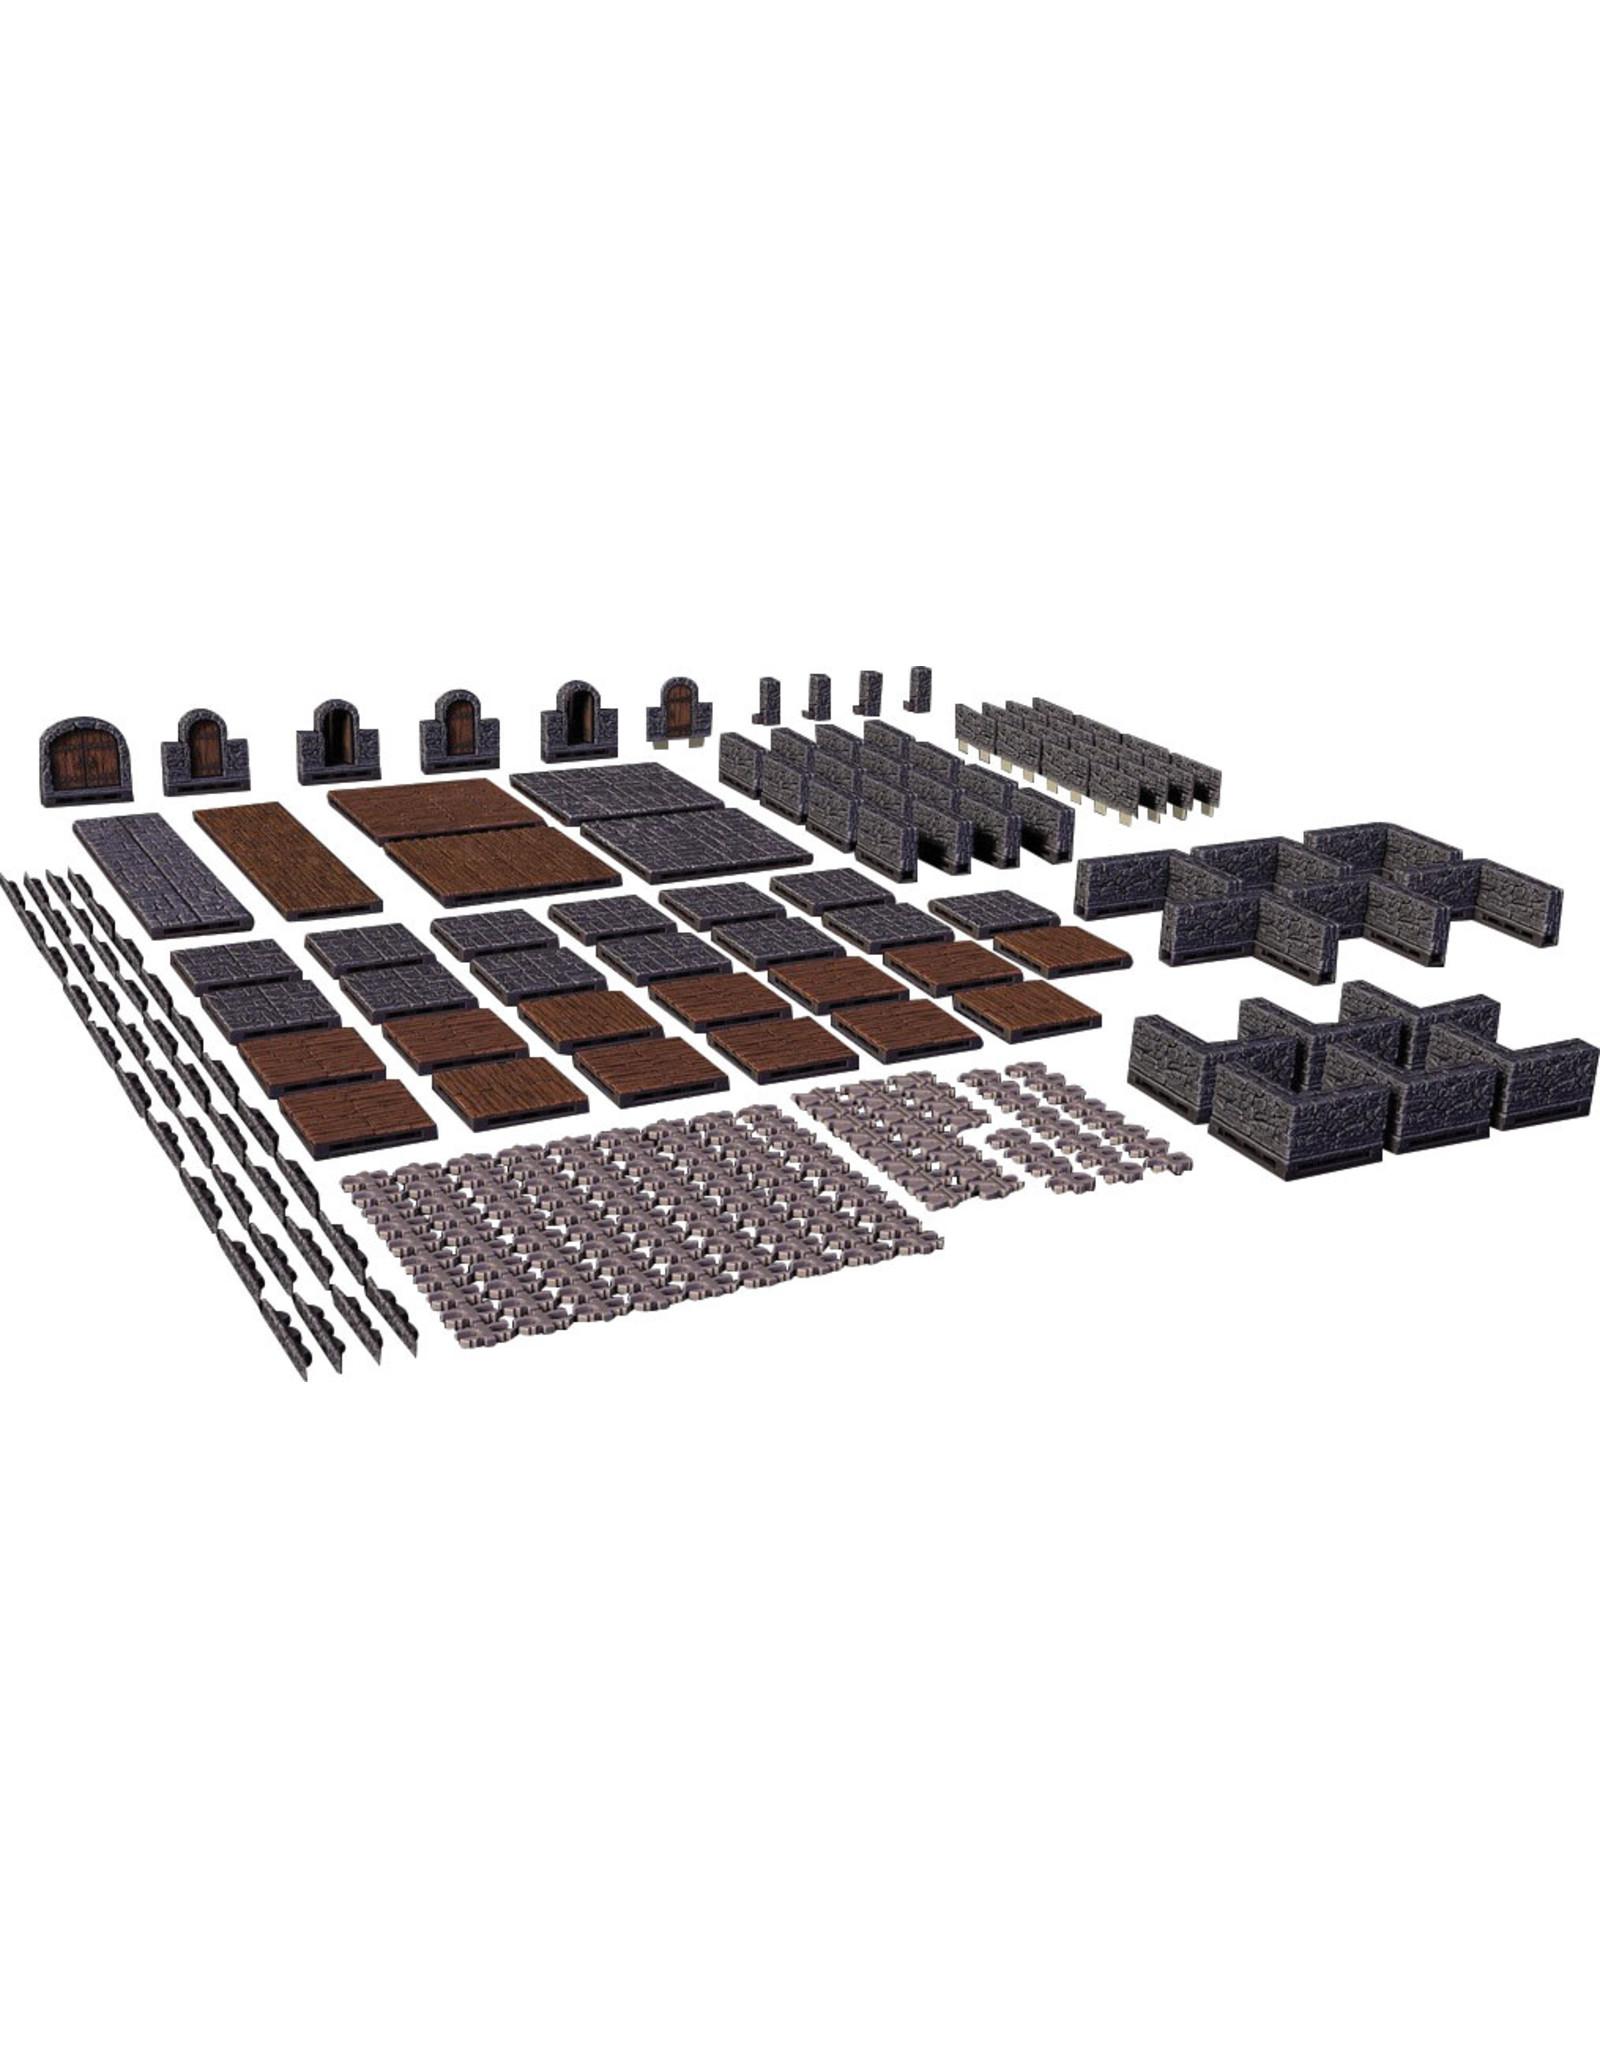 Warlock Tiles - Dungeon Tiles I